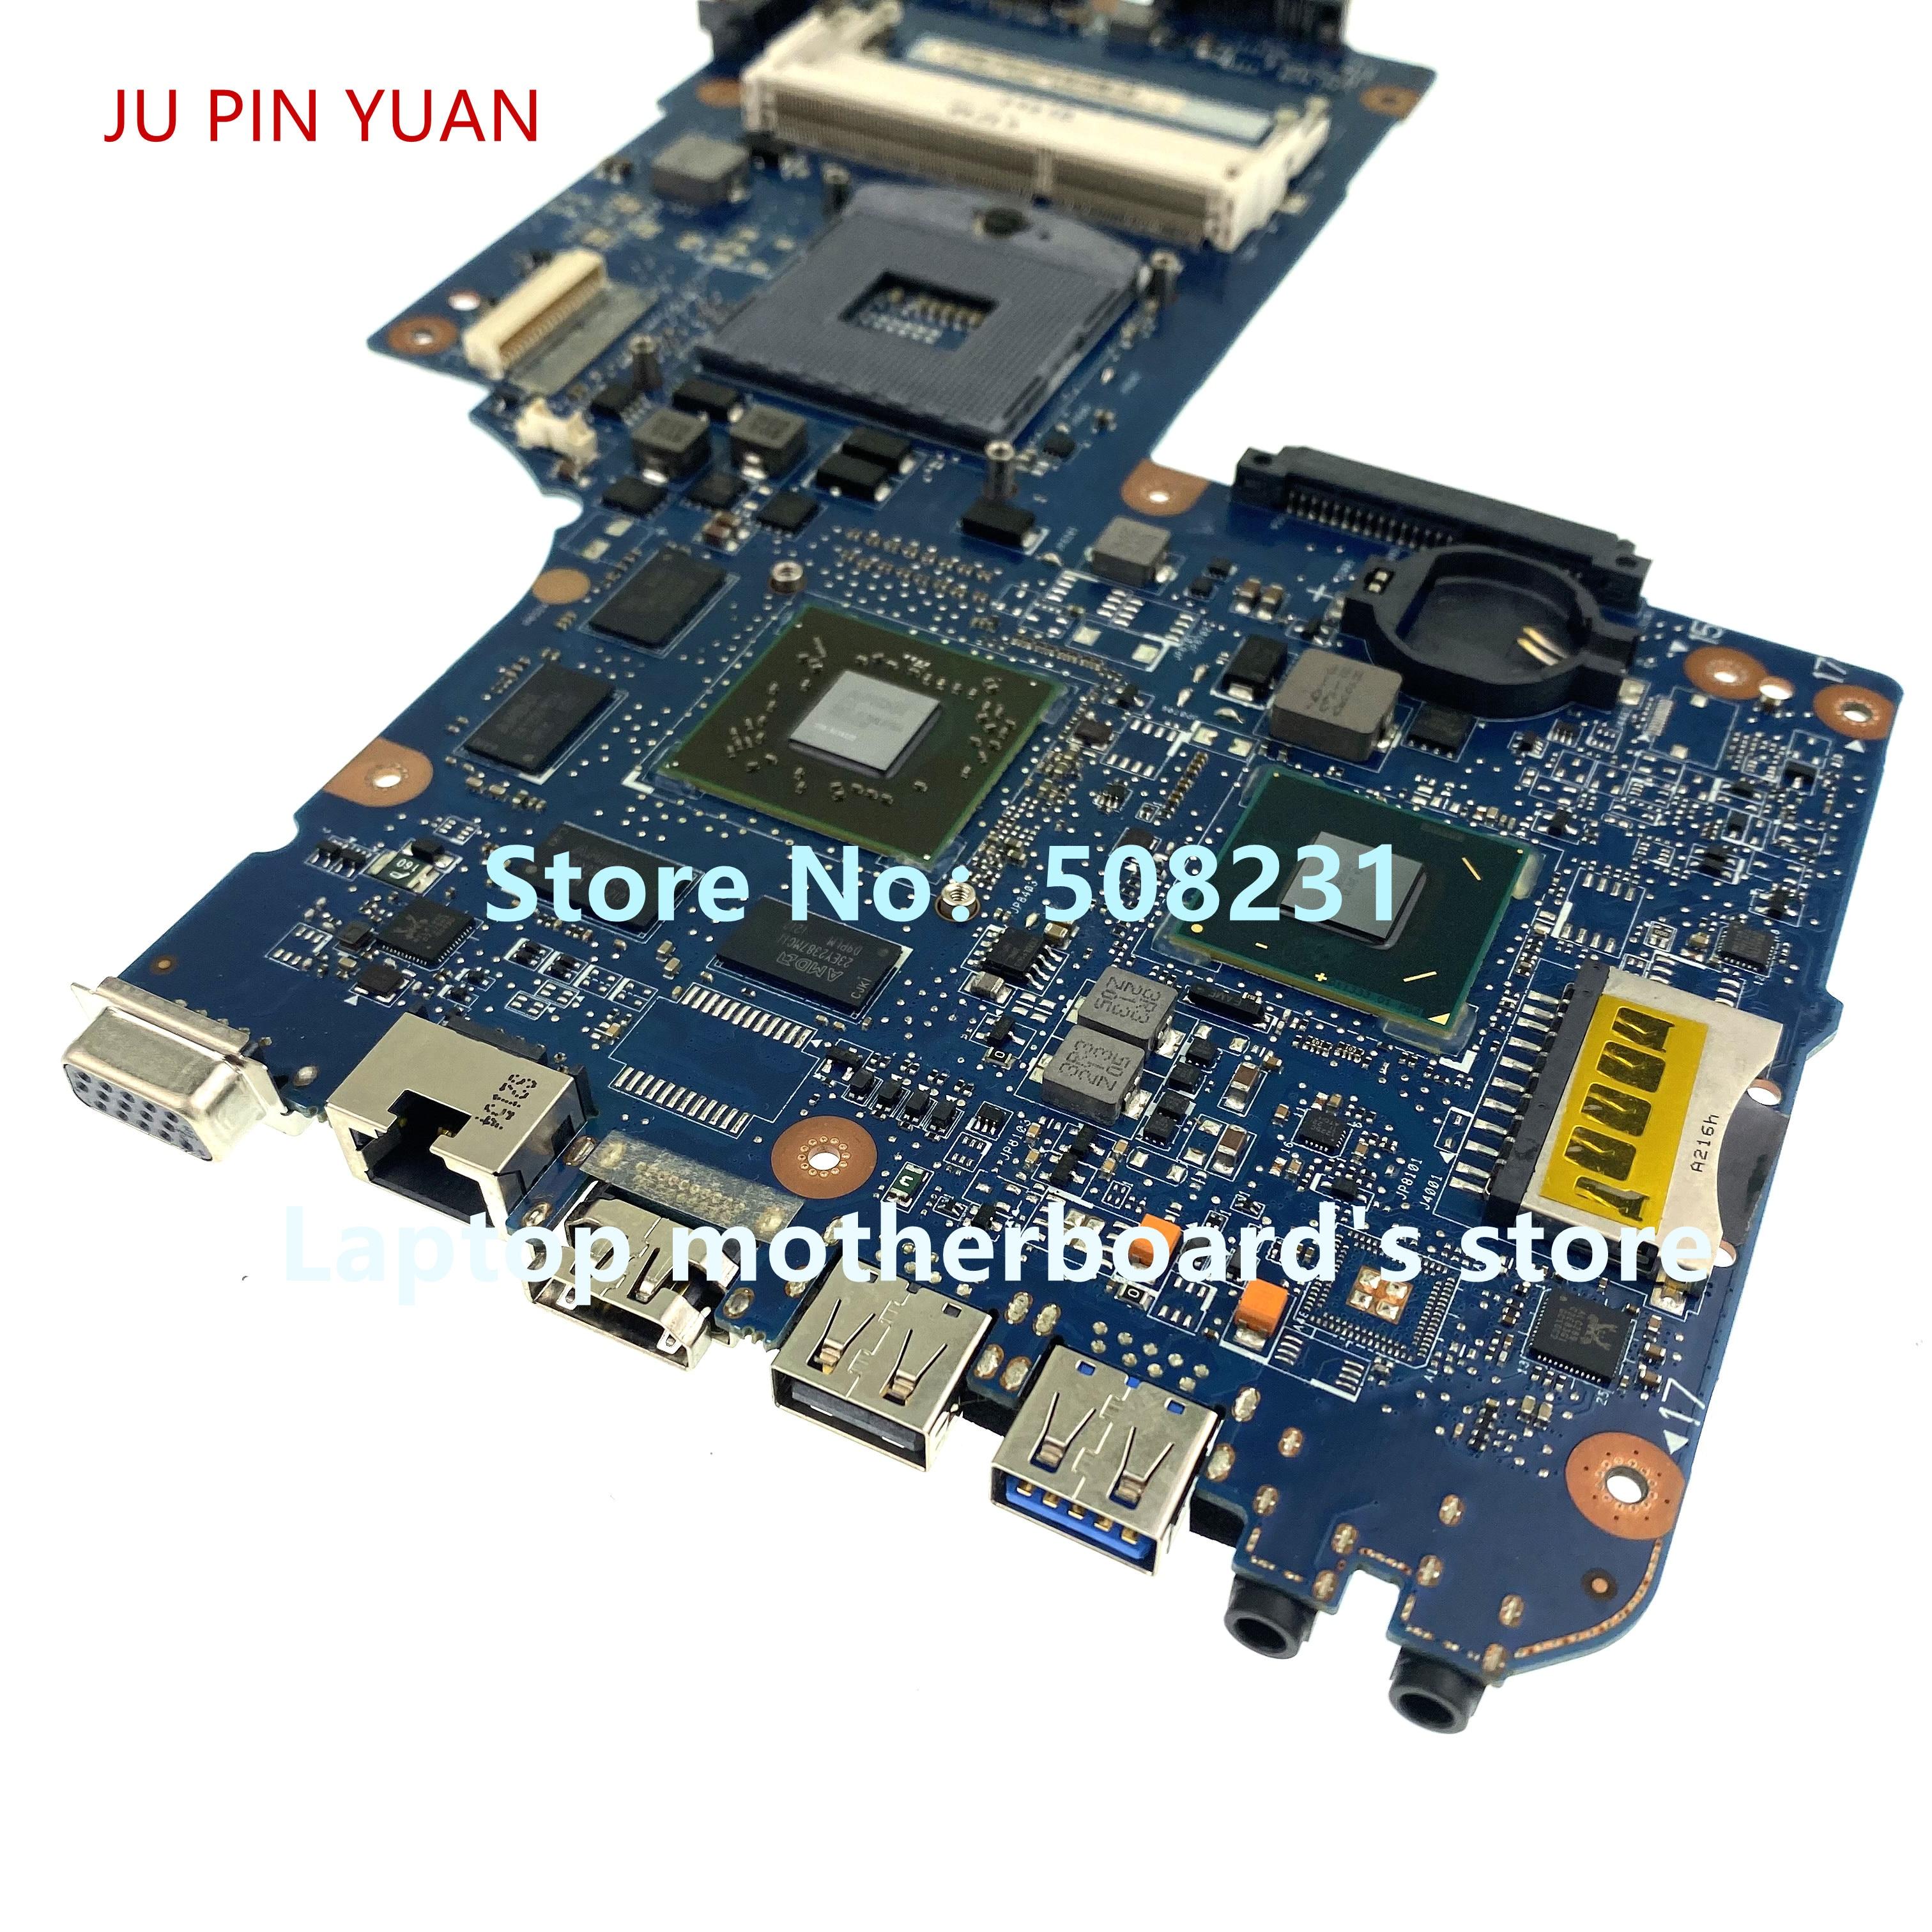 Toshiba Satellite L600D L640D L645D AMD Motherboard A000073410 DA0TE3MB6C0 Test